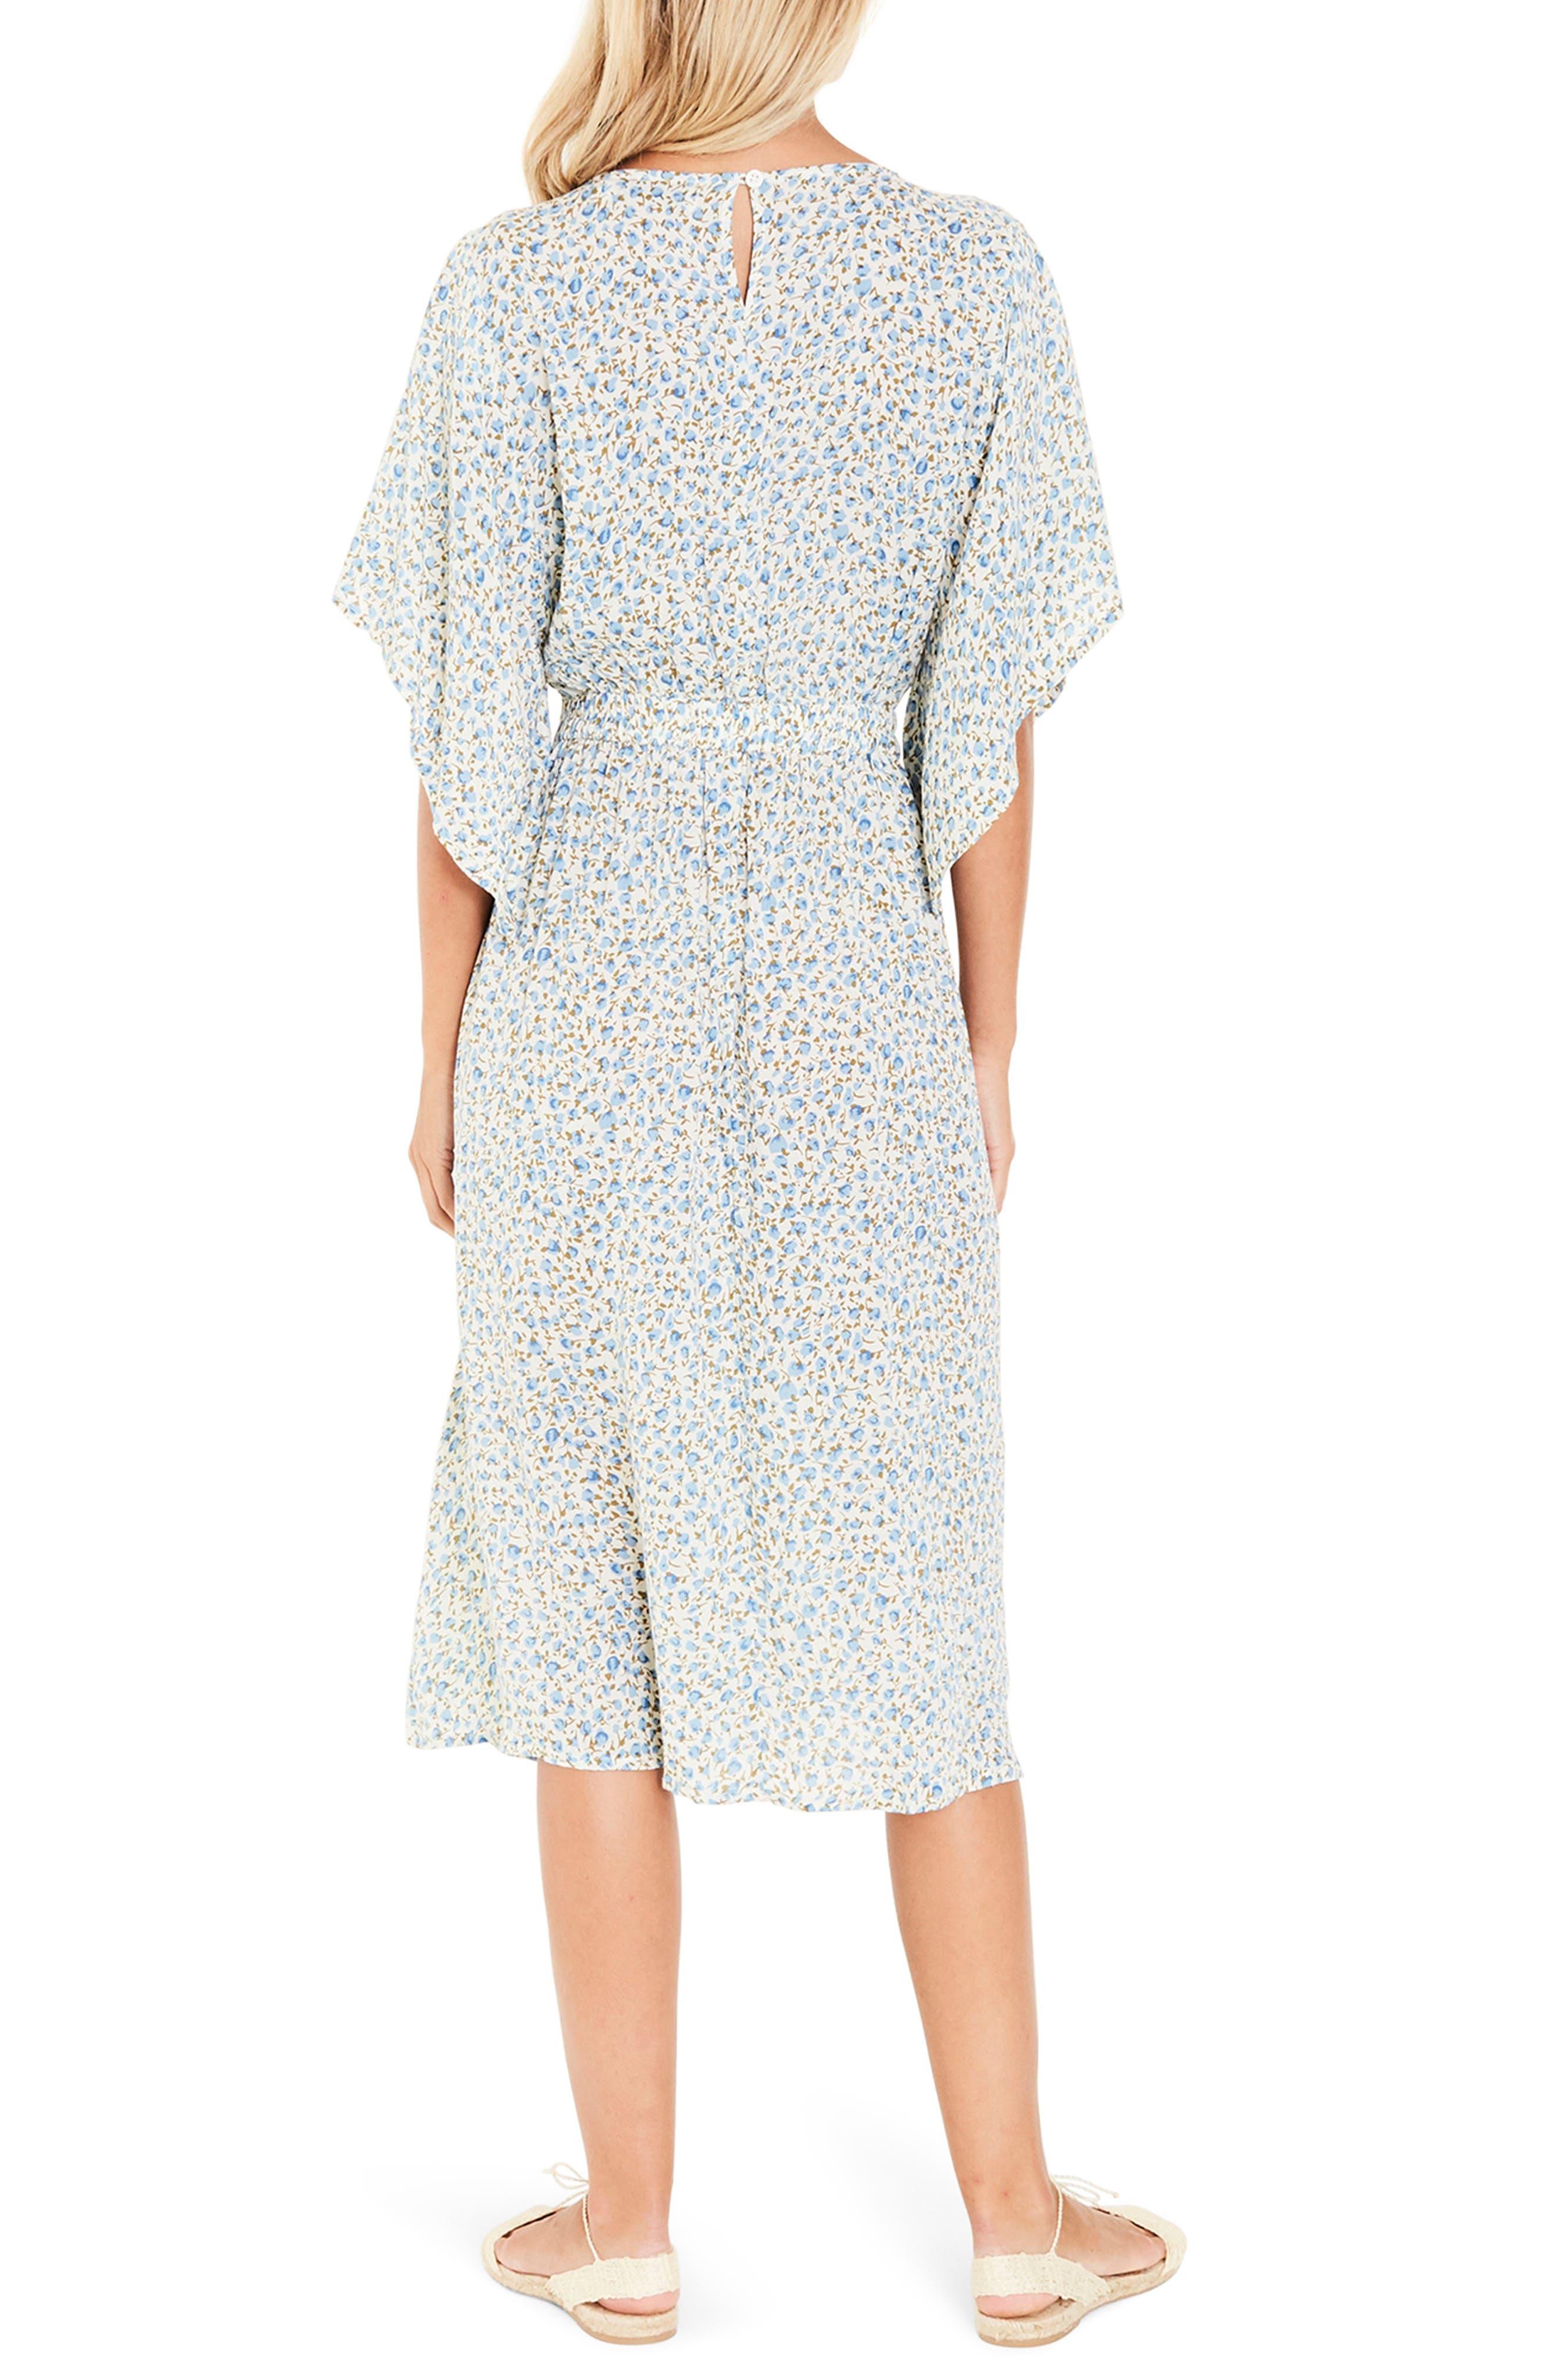 Massimo Tie Front Midi Dress,                             Alternate thumbnail 3, color,                             Dahlia Floral Print